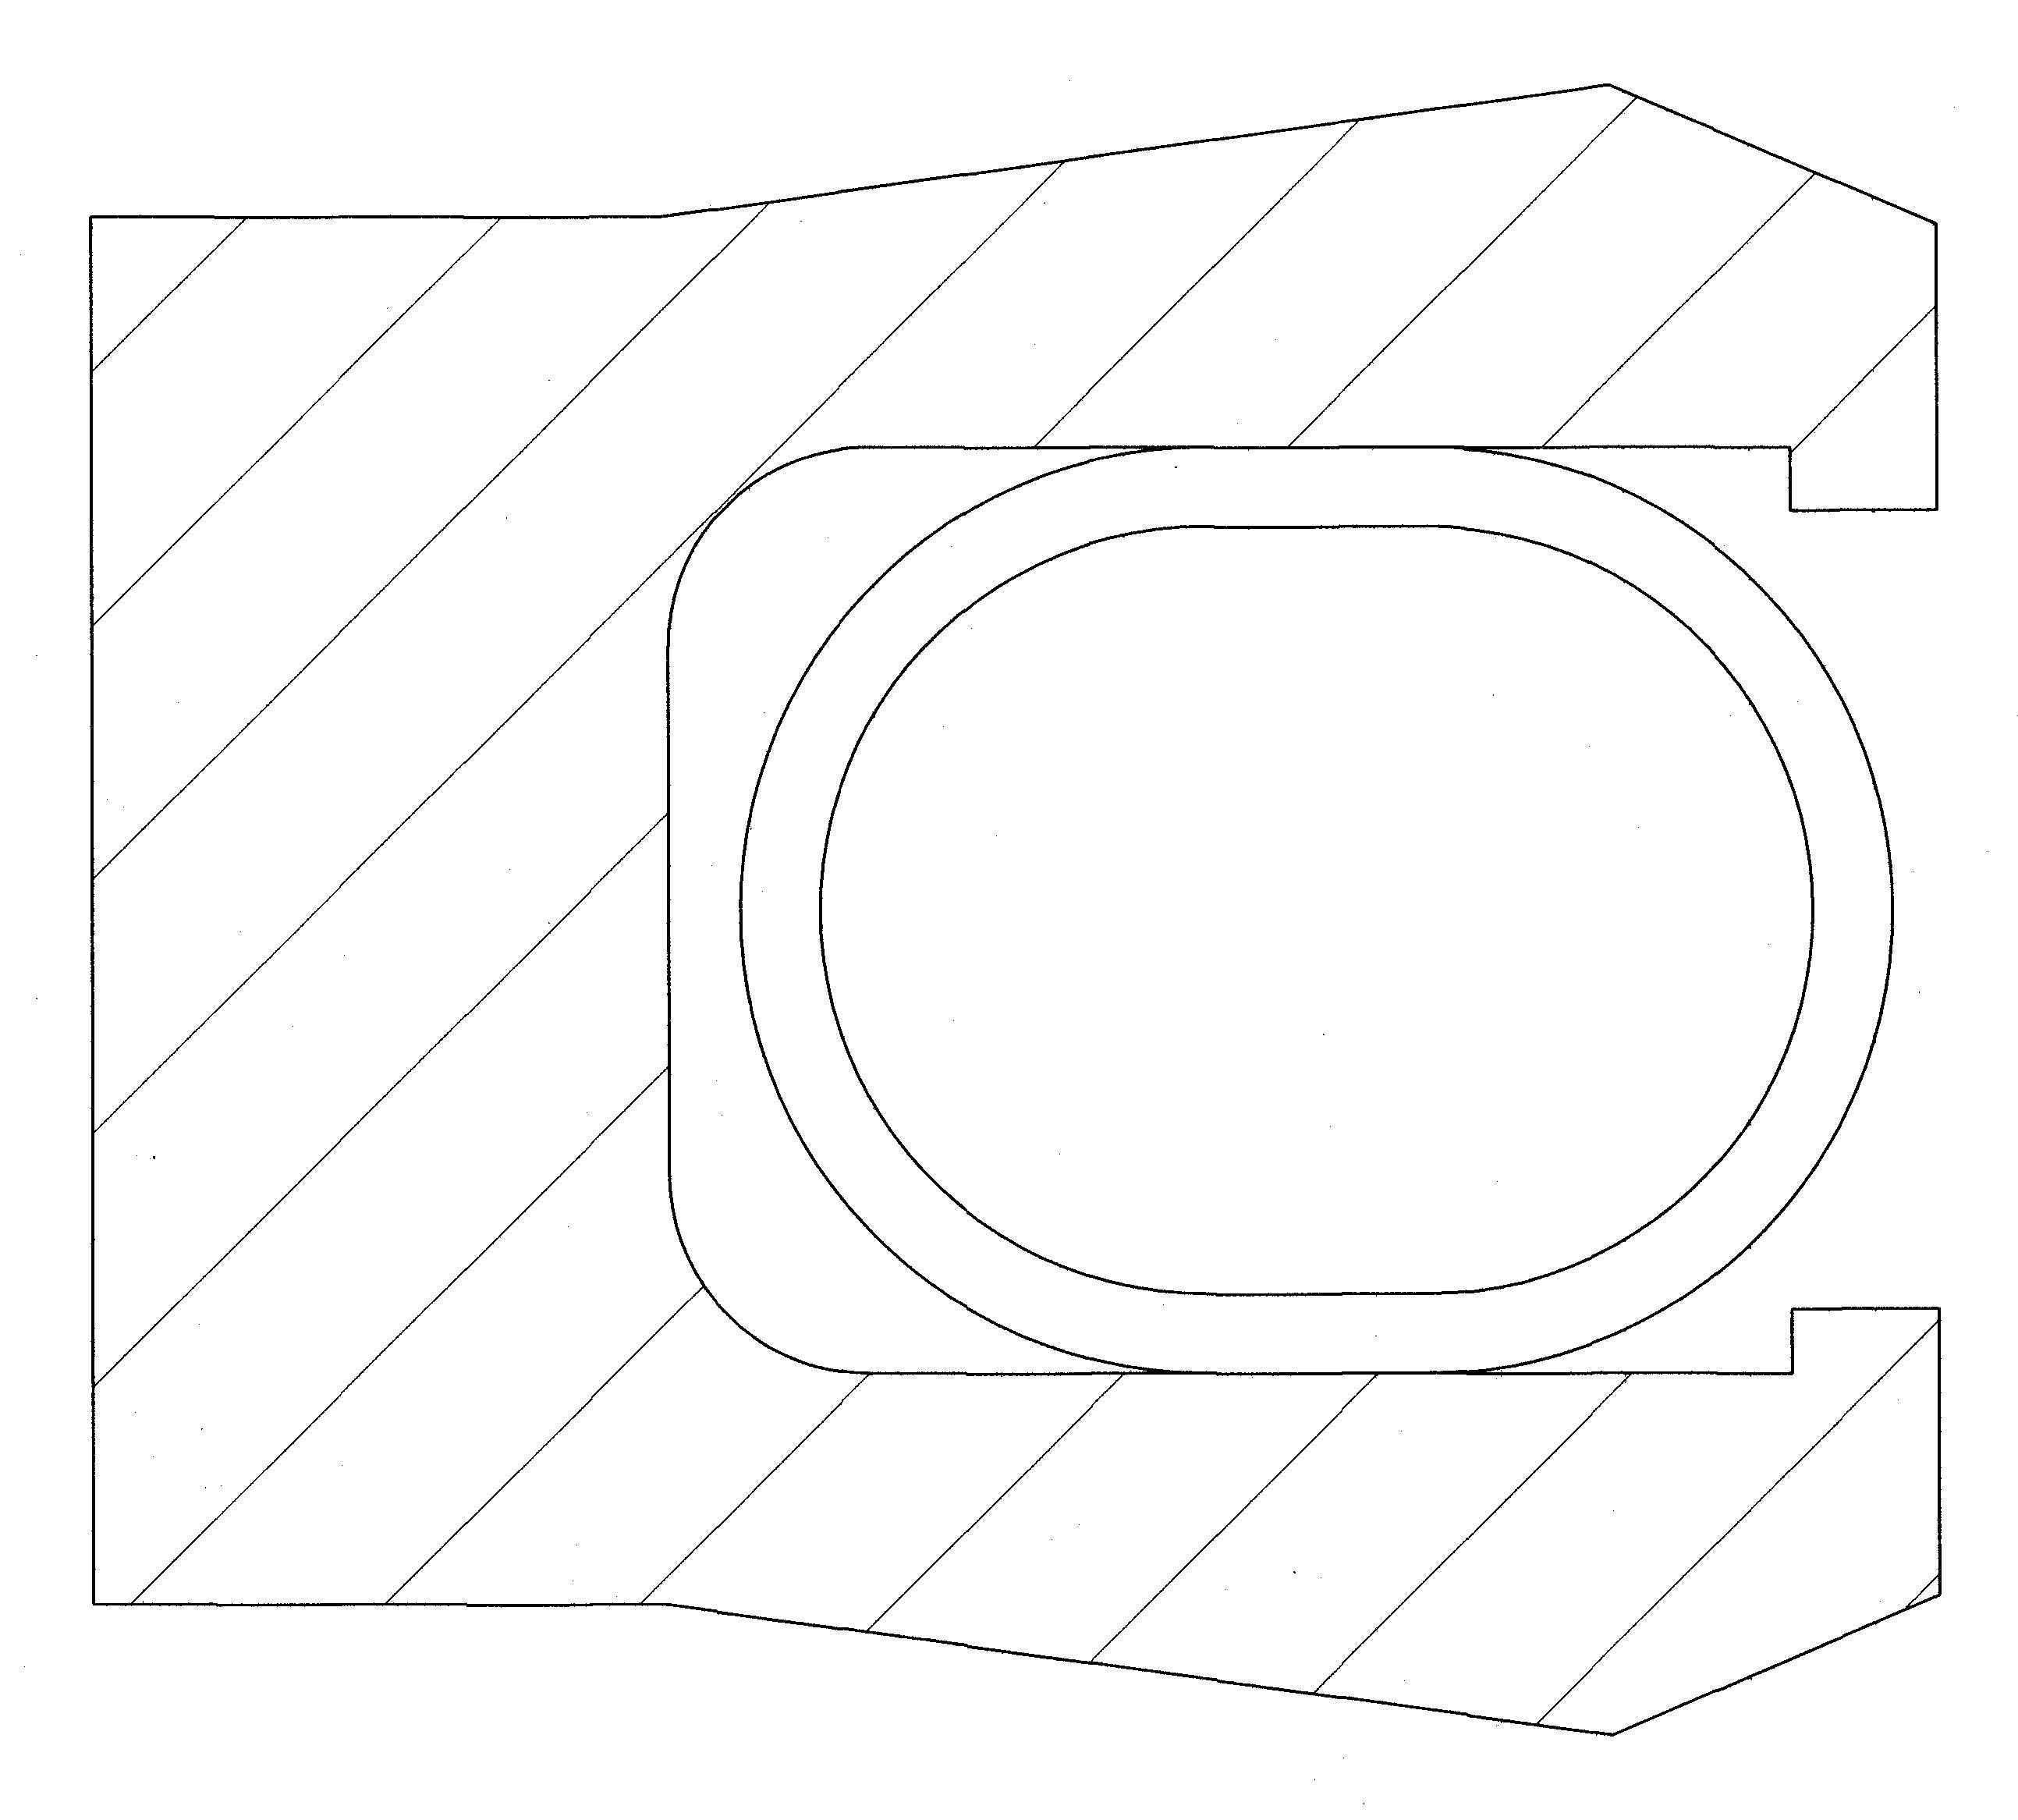 Slantedcoilseal